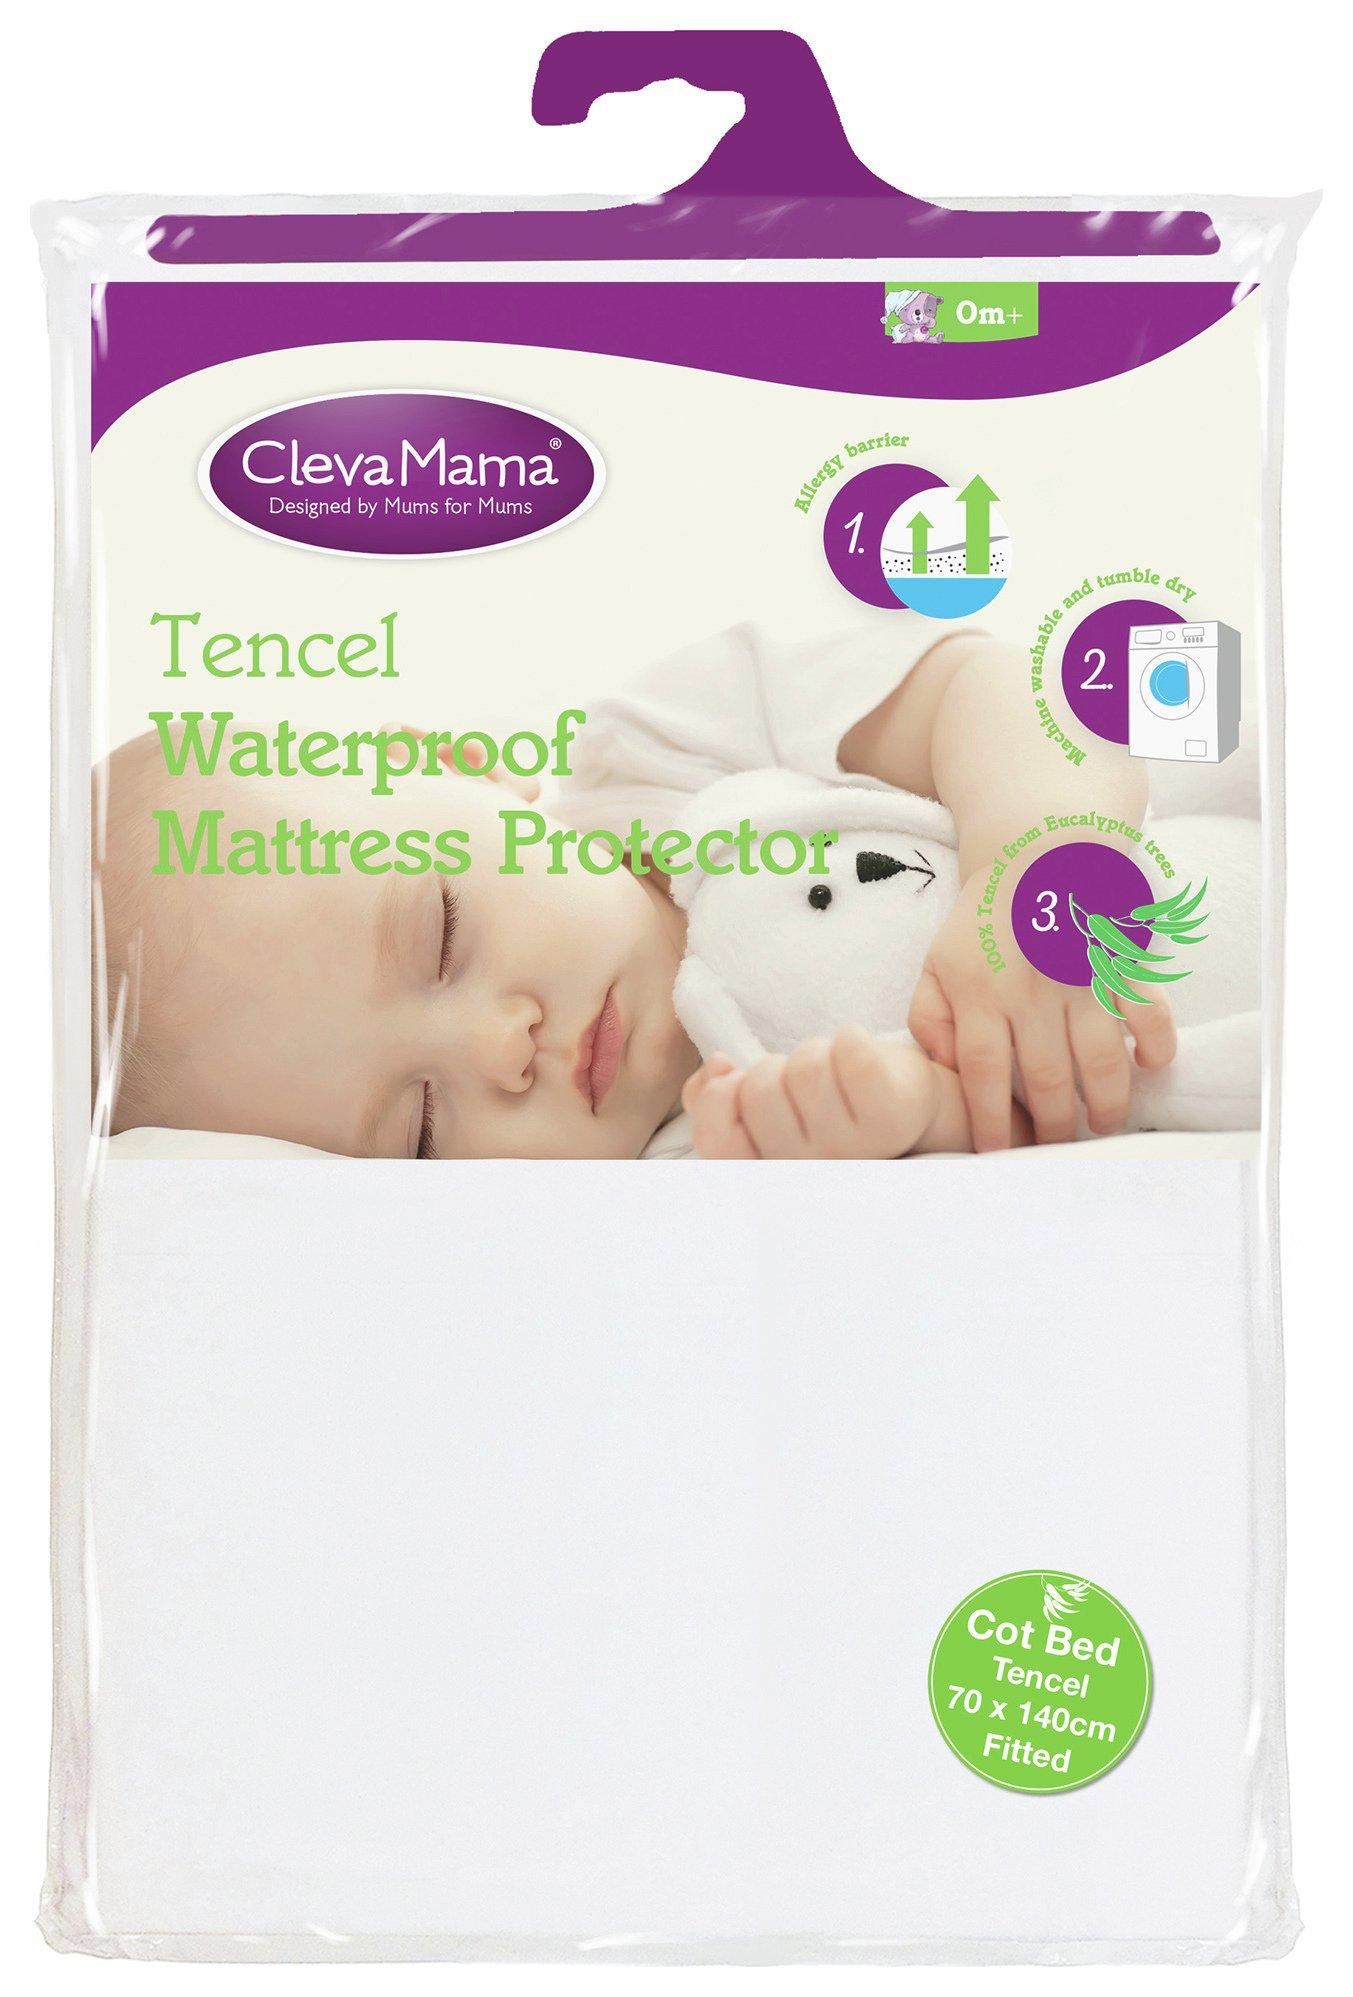 Image of Clevamama - Tencel Waterproof - Mattress Protector - 90x40cm